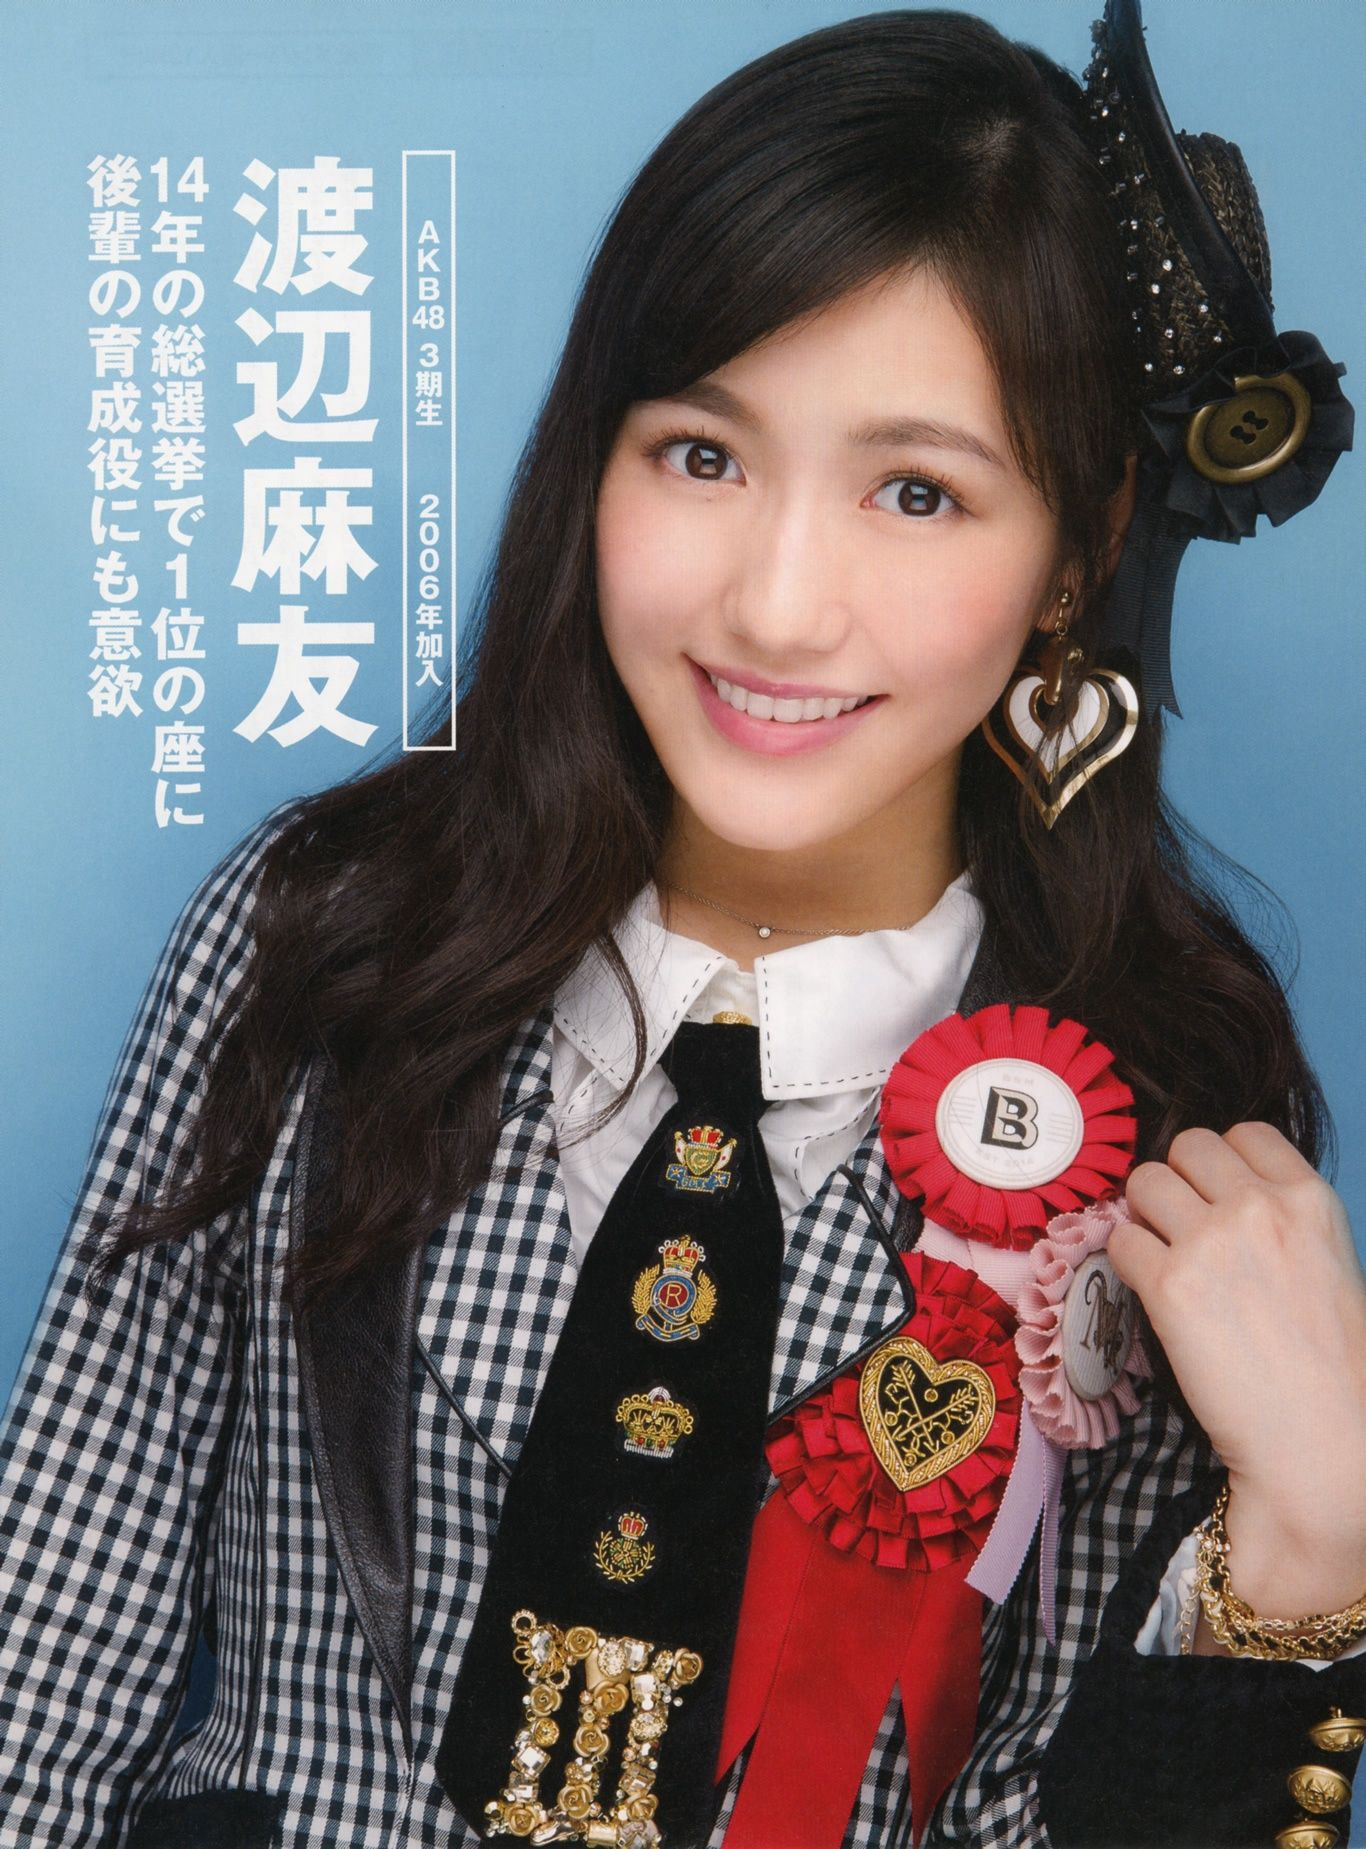 AKB48, Mayu Watanabe, Smile, Idol, Black Hair, Japanese Text